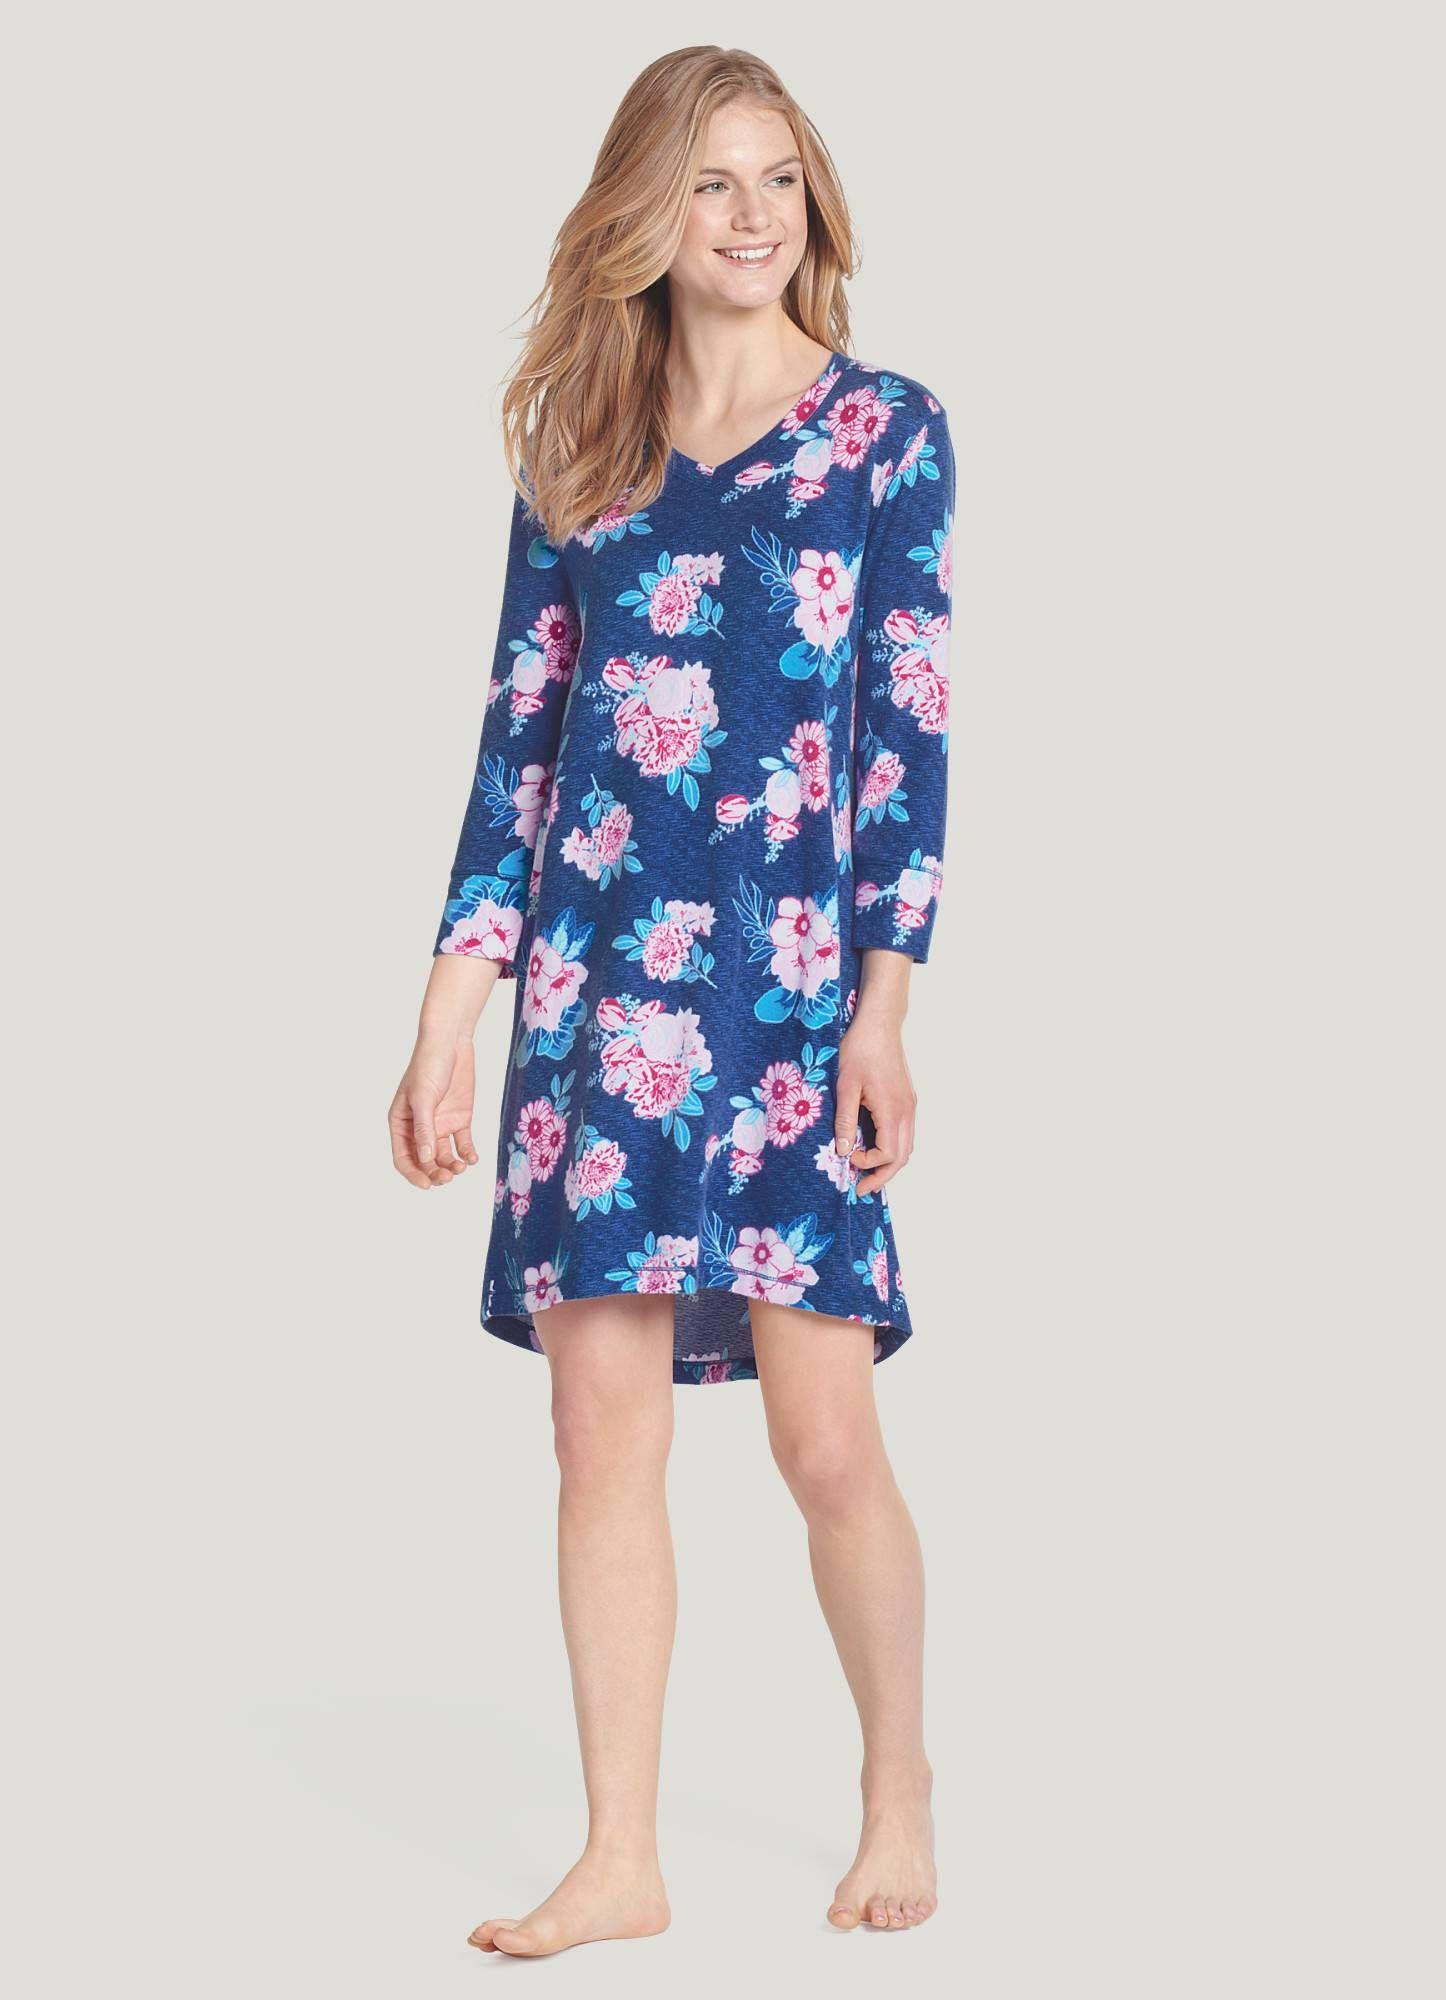 Jockey Womens Sleepwear Brilliant Blooms Short